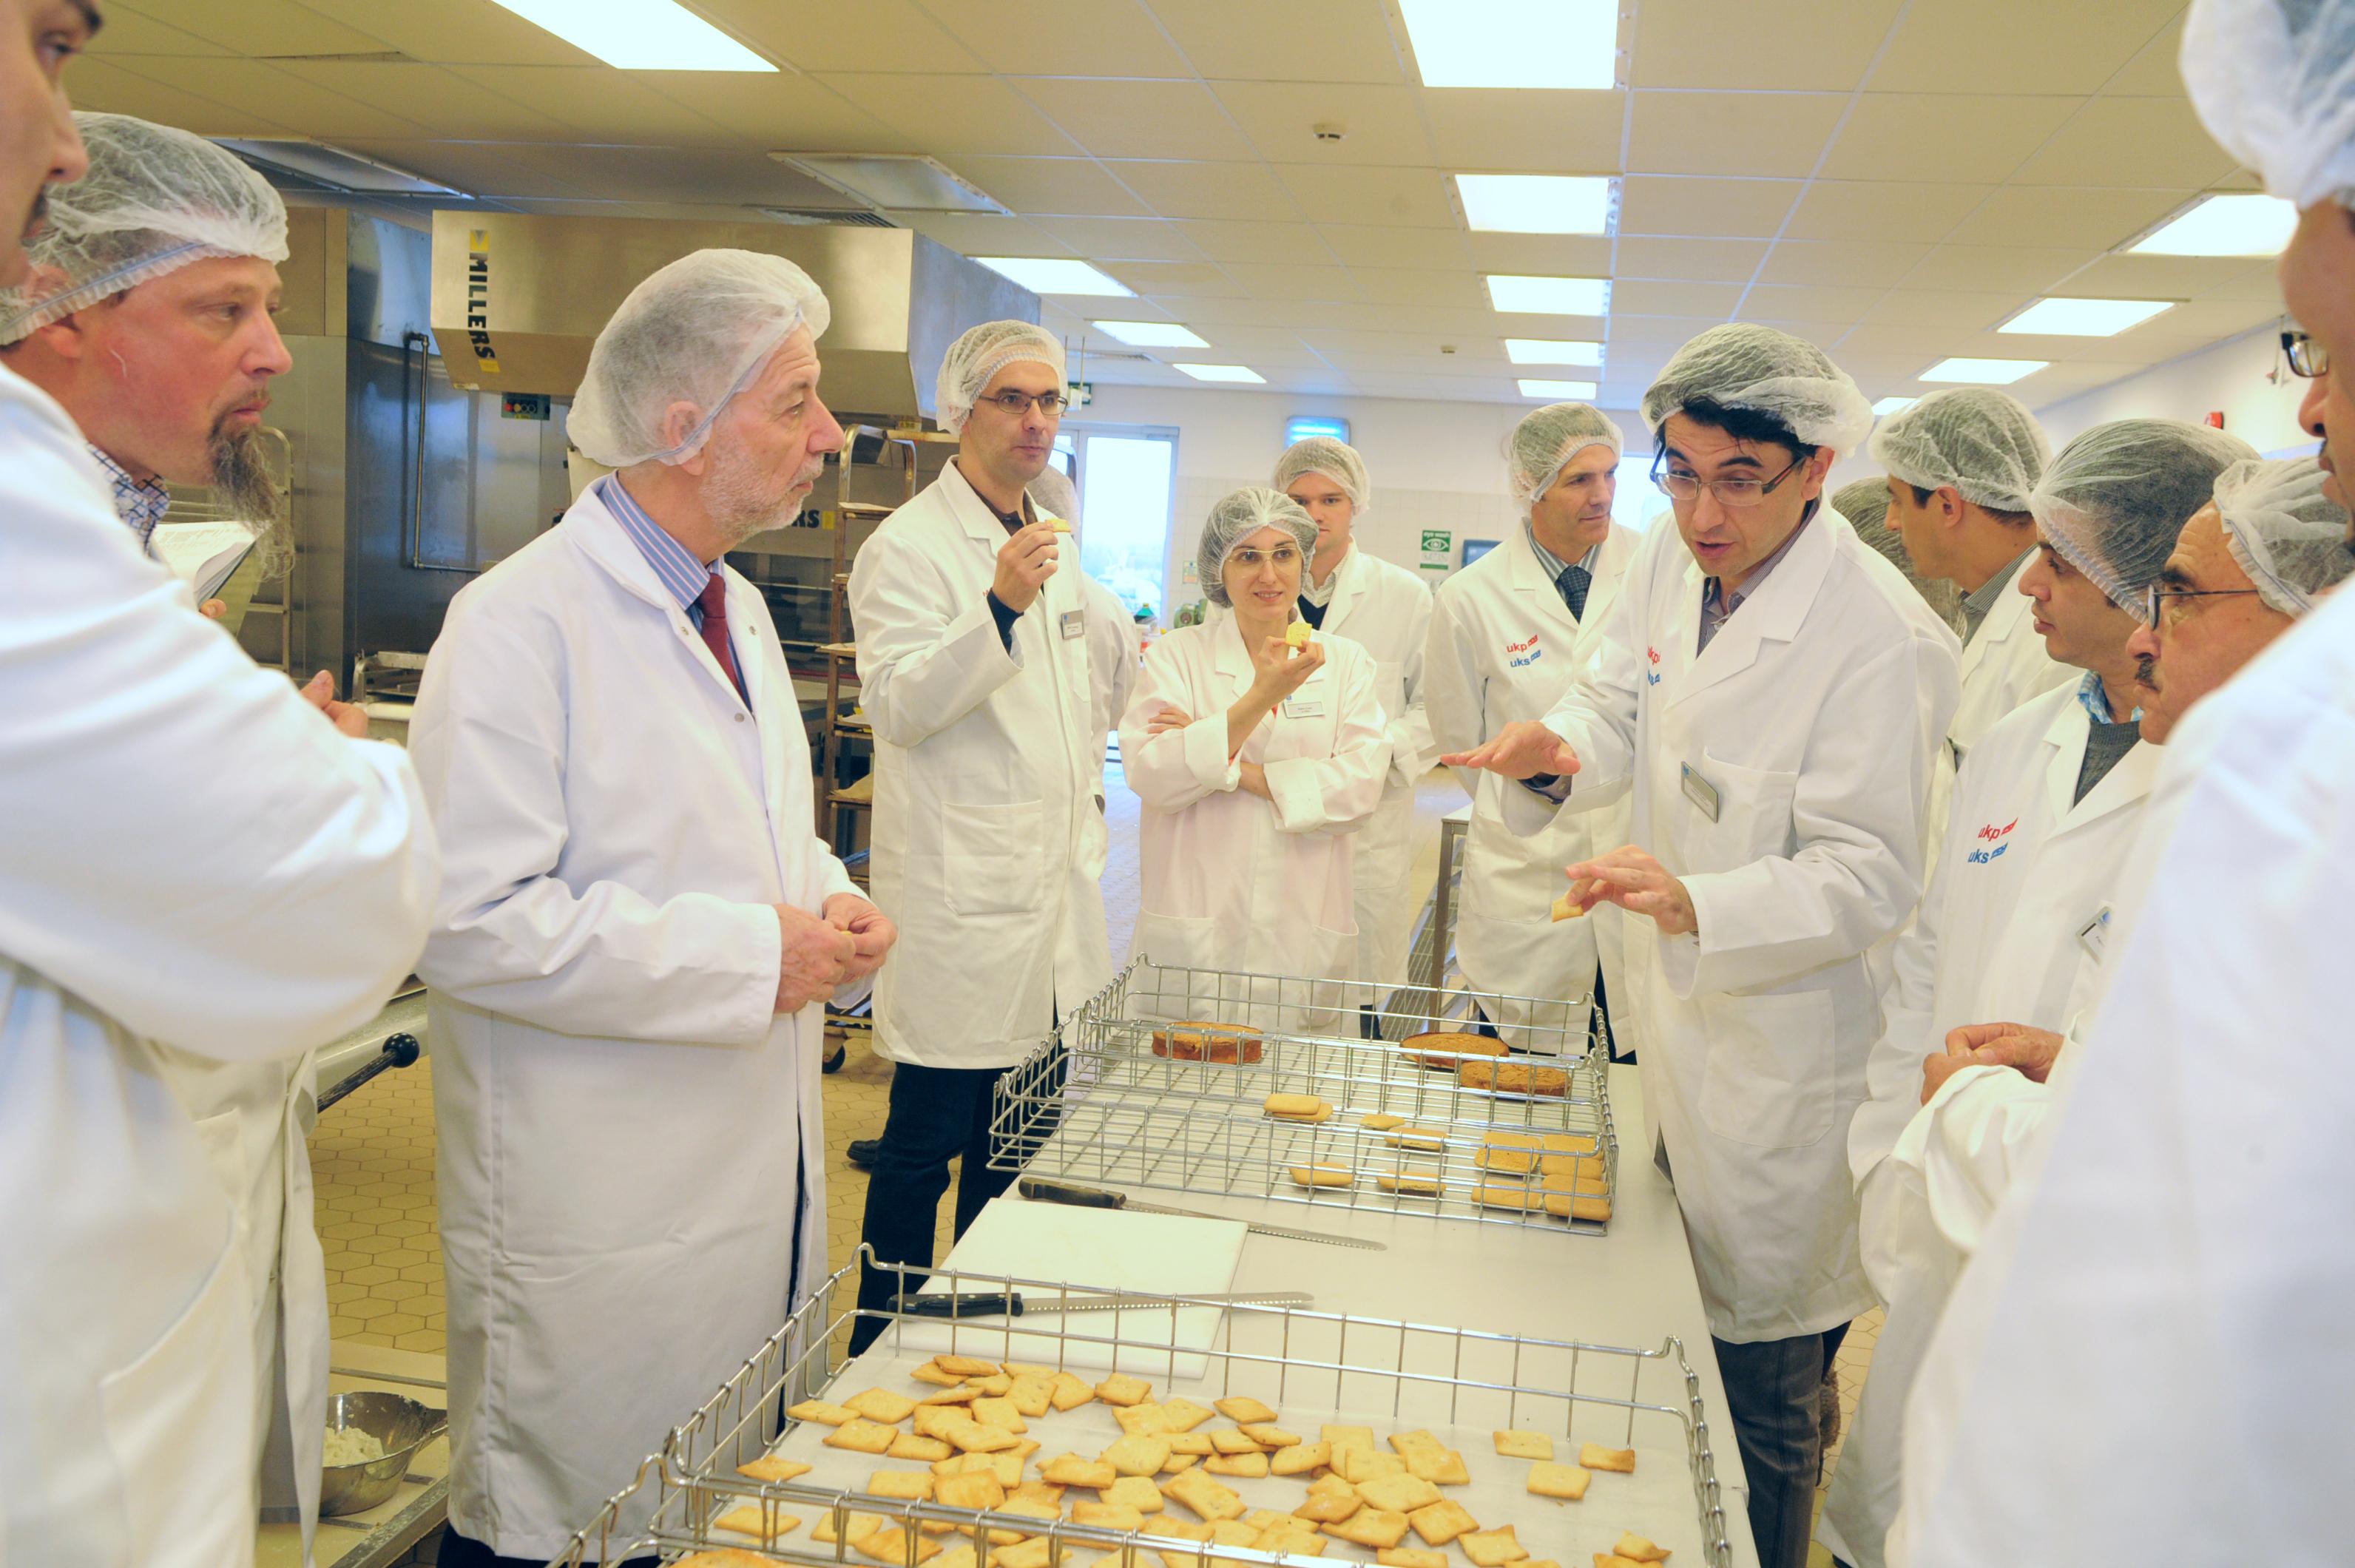 International Baking Workshop to showcase British milling wheat export potential